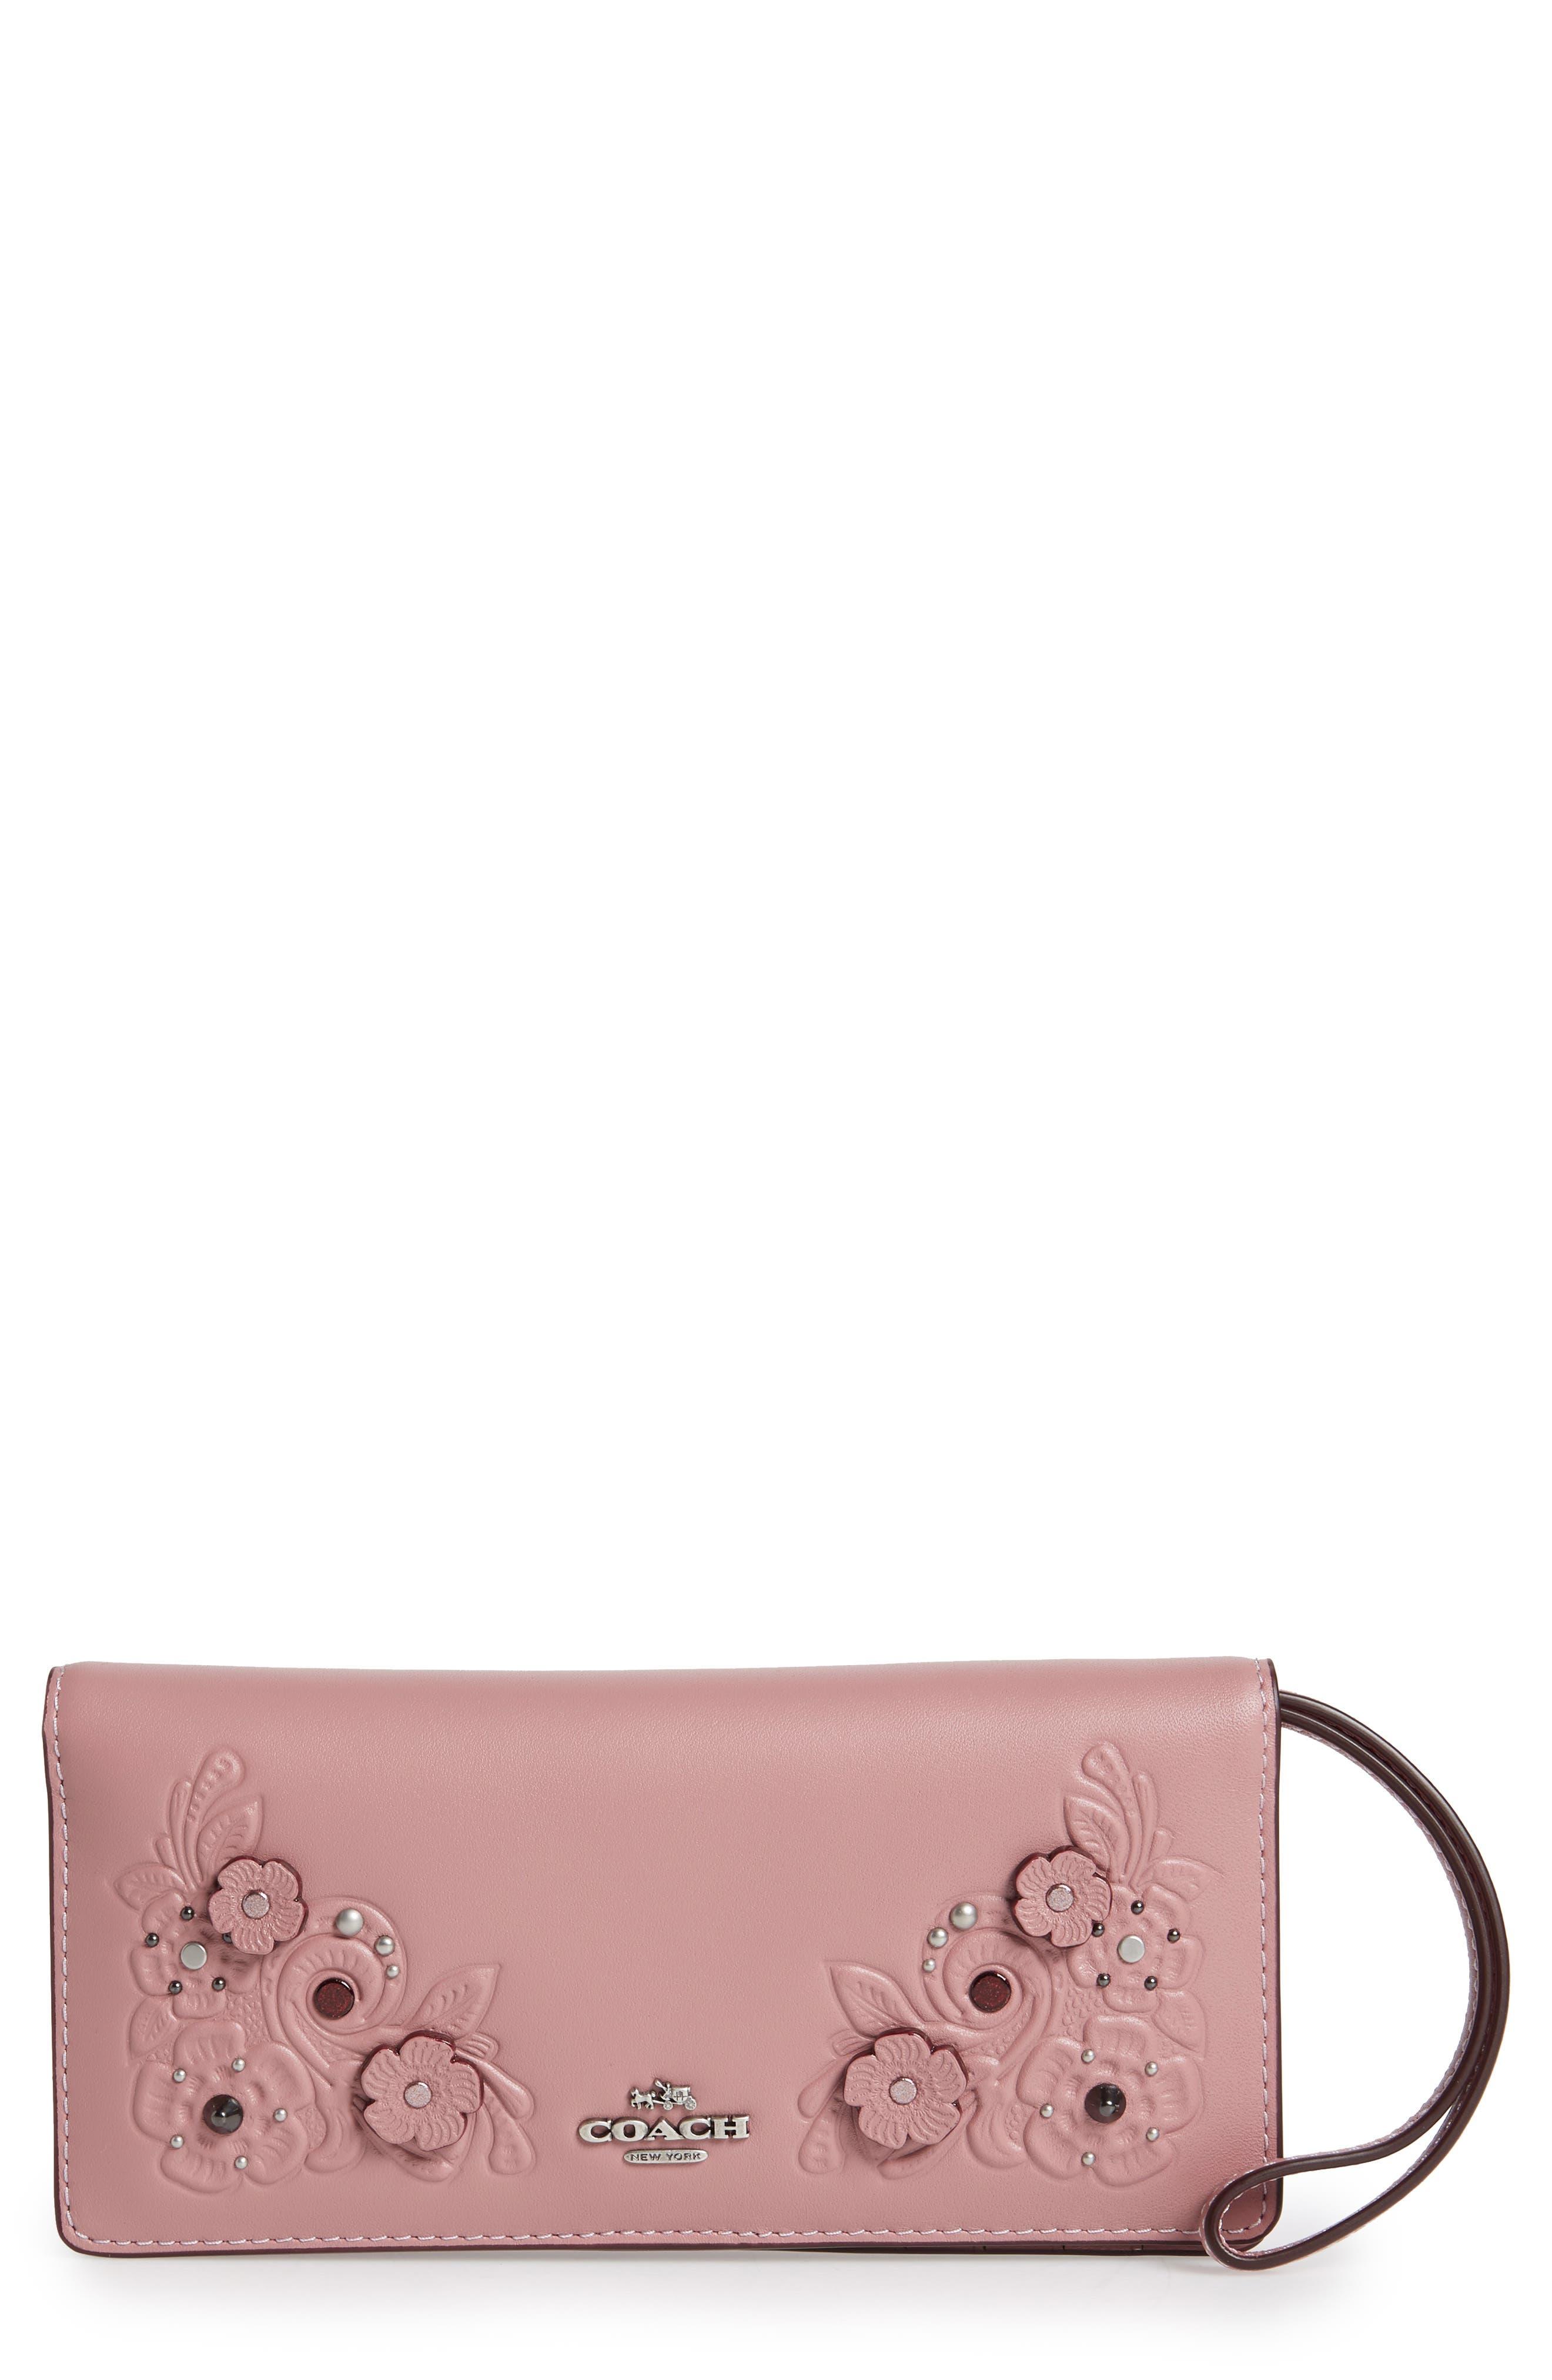 Alternate Image 1 Selected - COACH Slim Tea Rose Calfskin Leather Wristlet